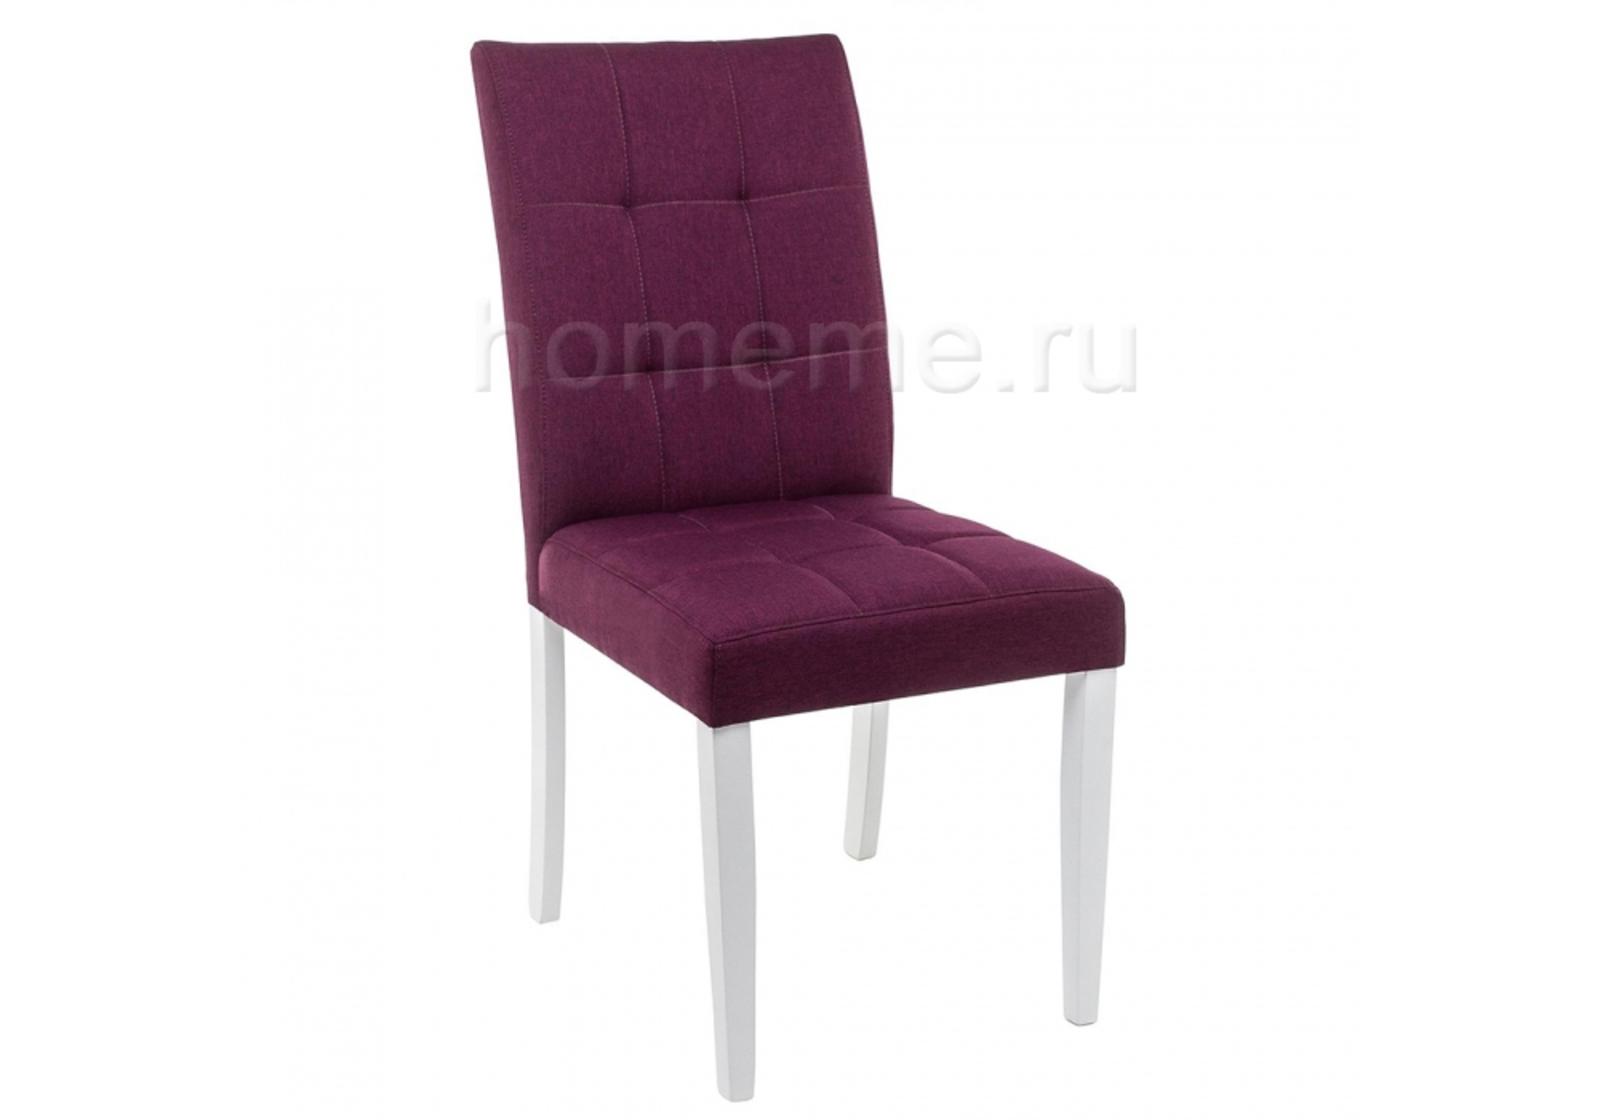 Стул HomeMe Madina white / fabric purple 11032 от Homeme.ru